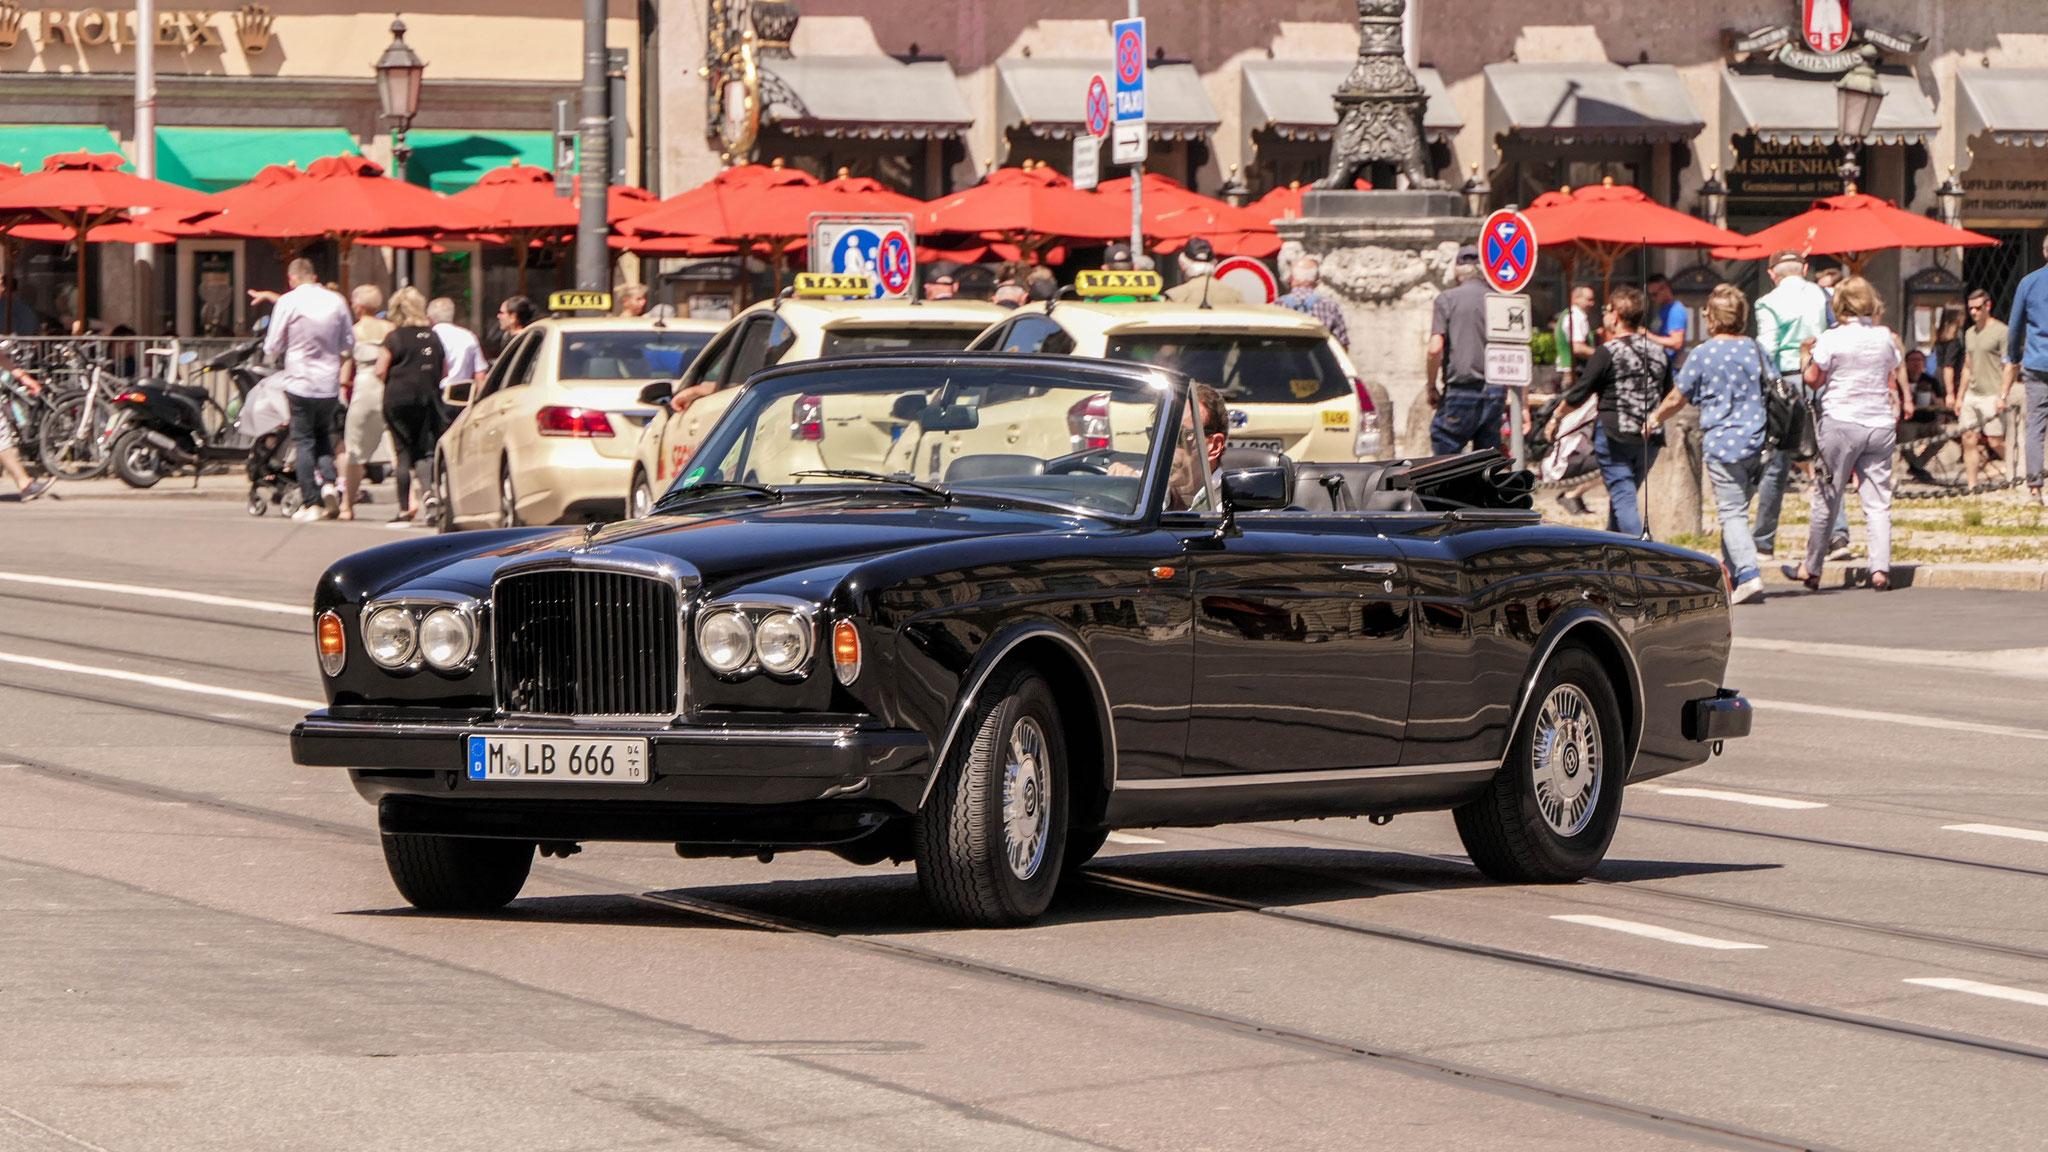 Rolls Royce Corniche - M-LB-666